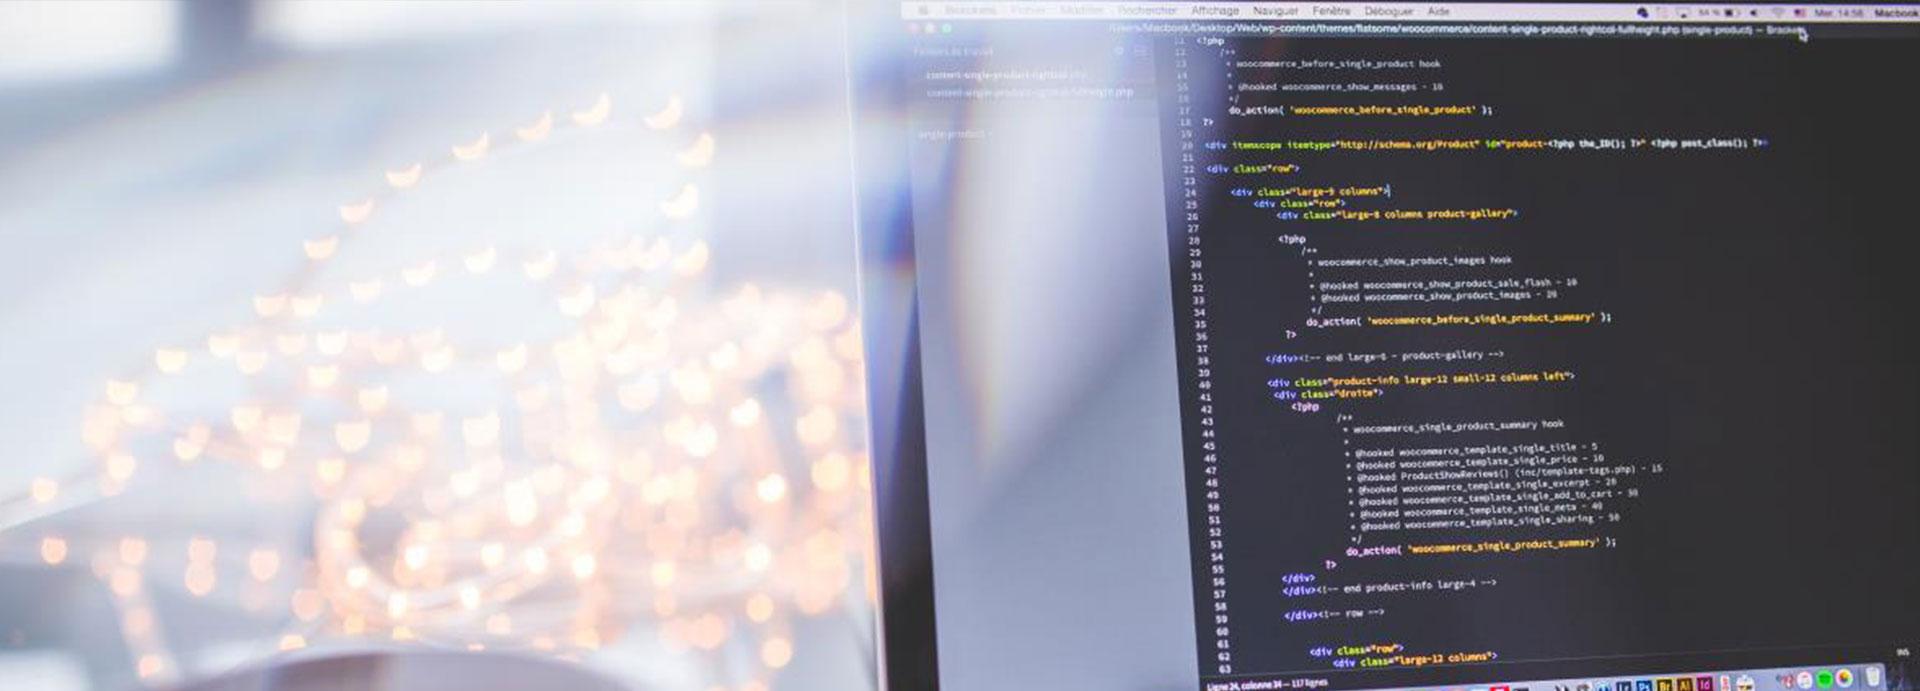 Iblesoft Inc DotNetNuke Development